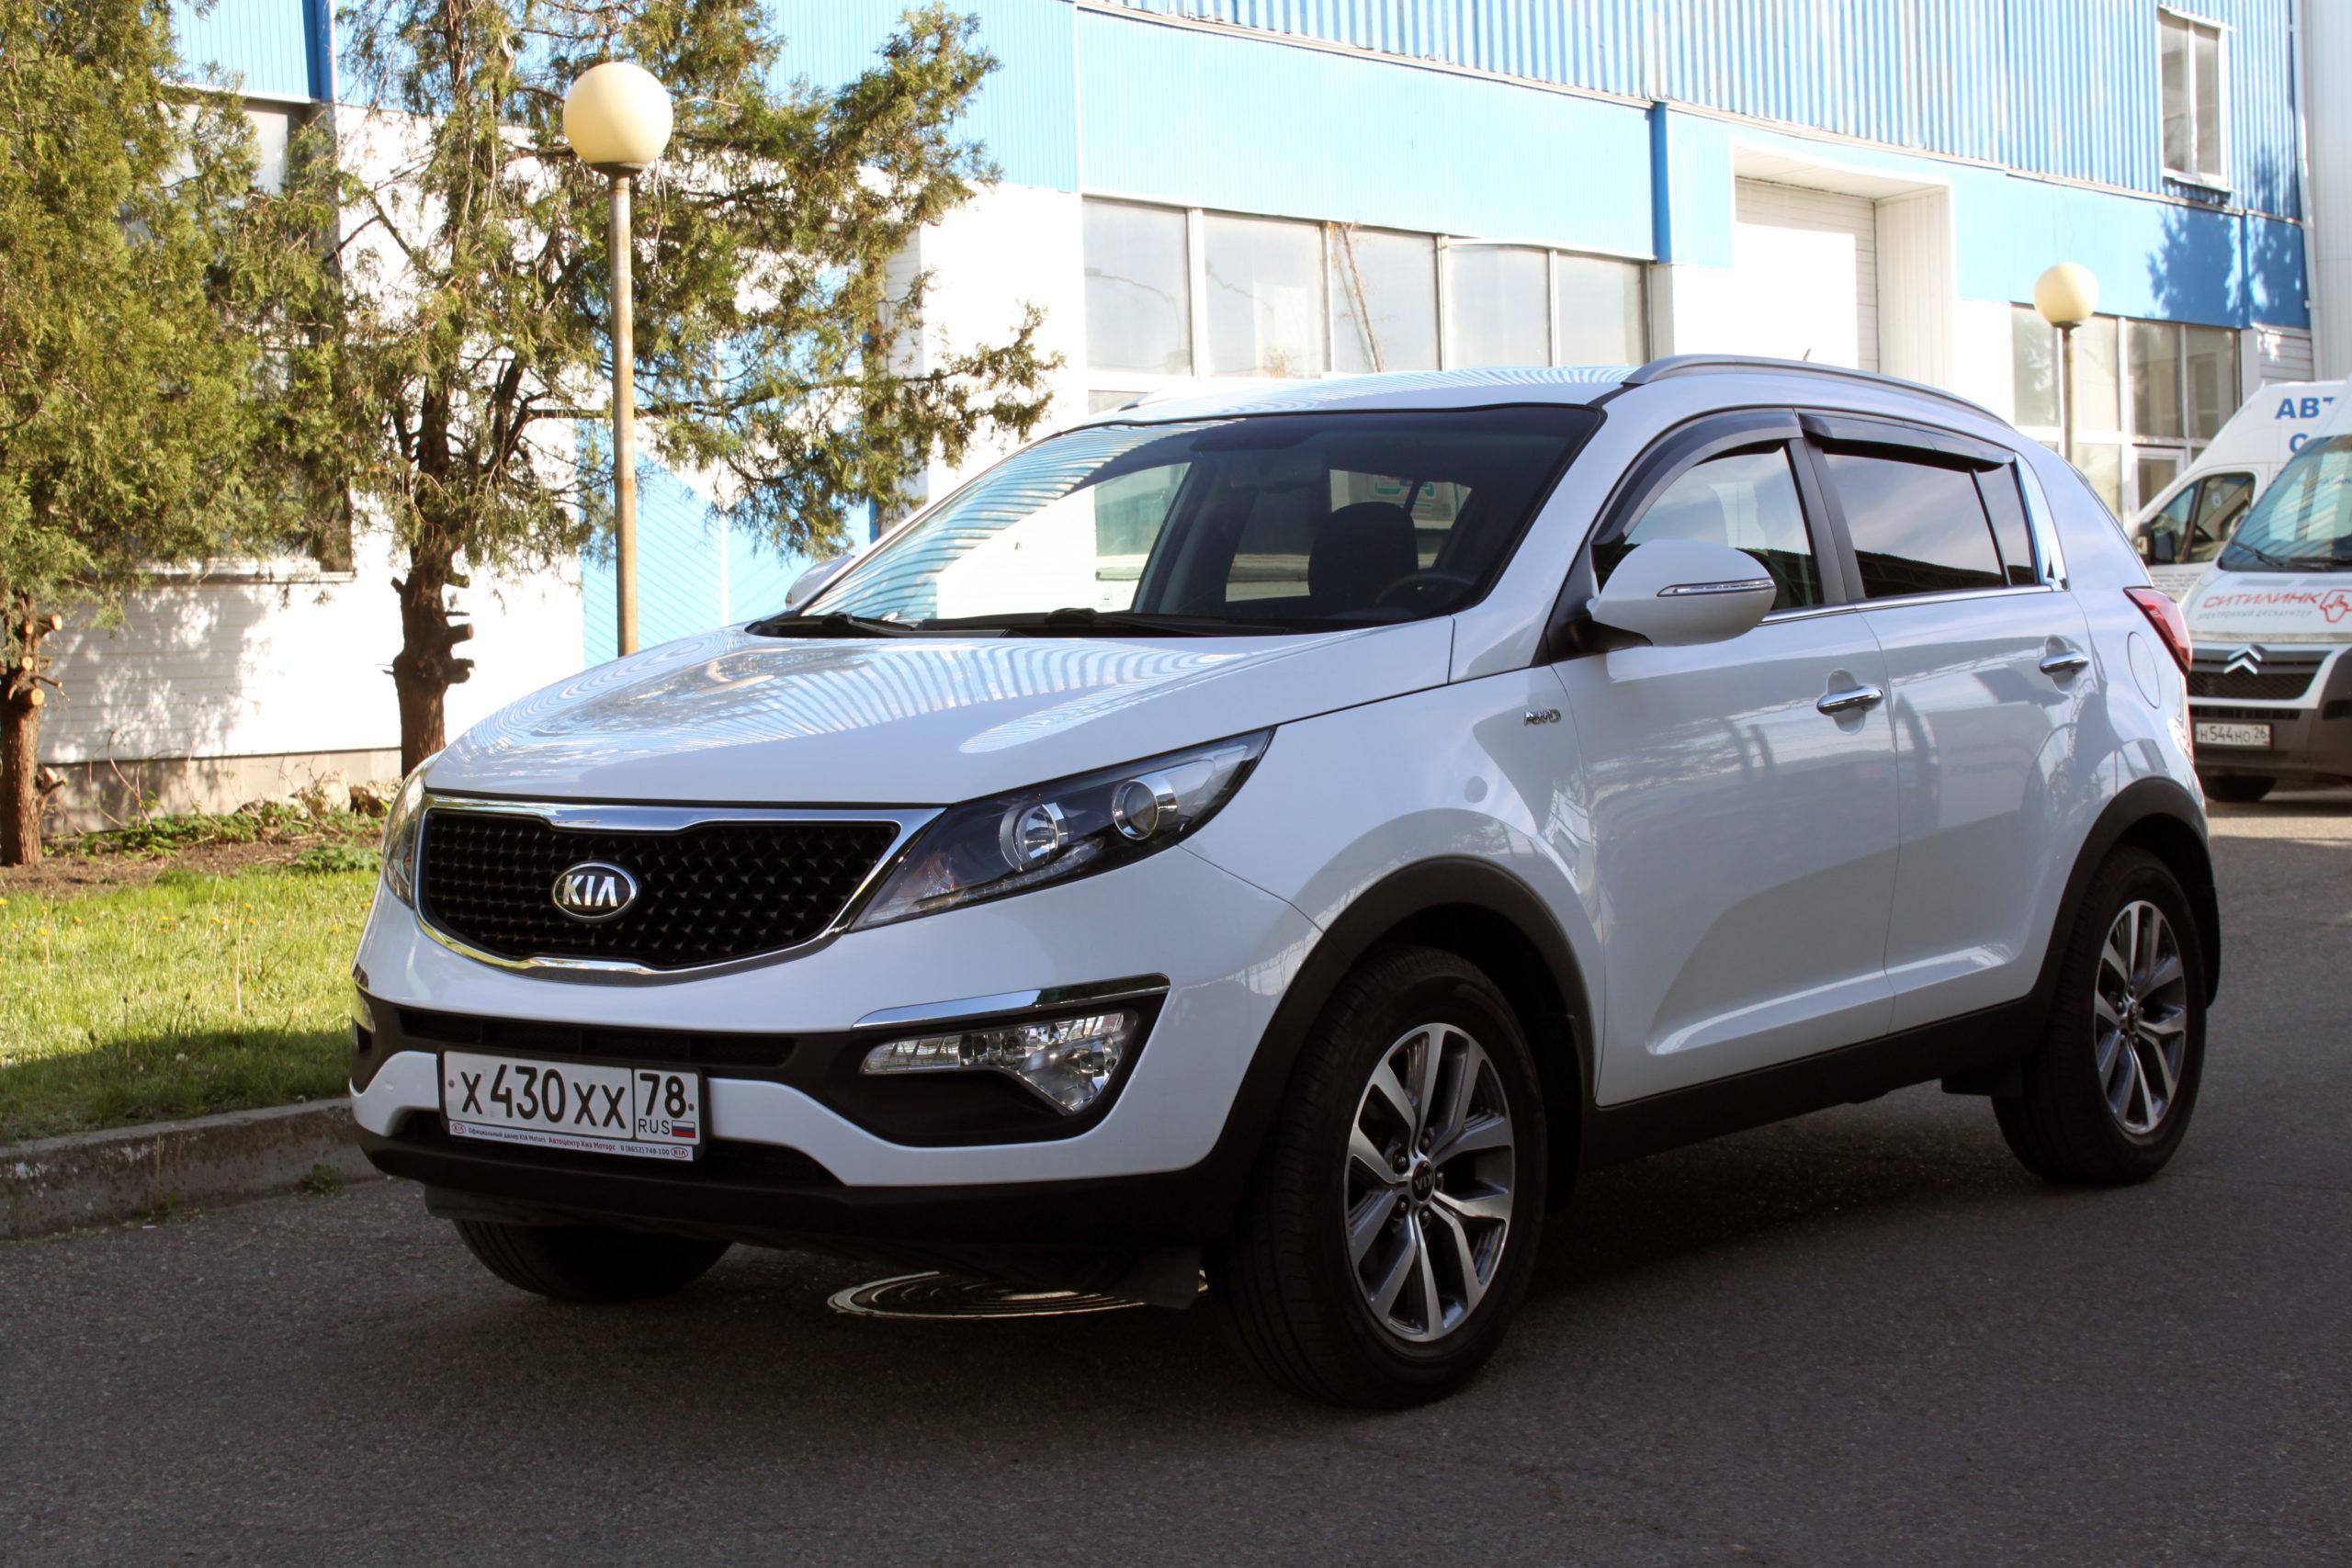 Купить KIA Sportage (Белый) - Автопарк Ставрополь